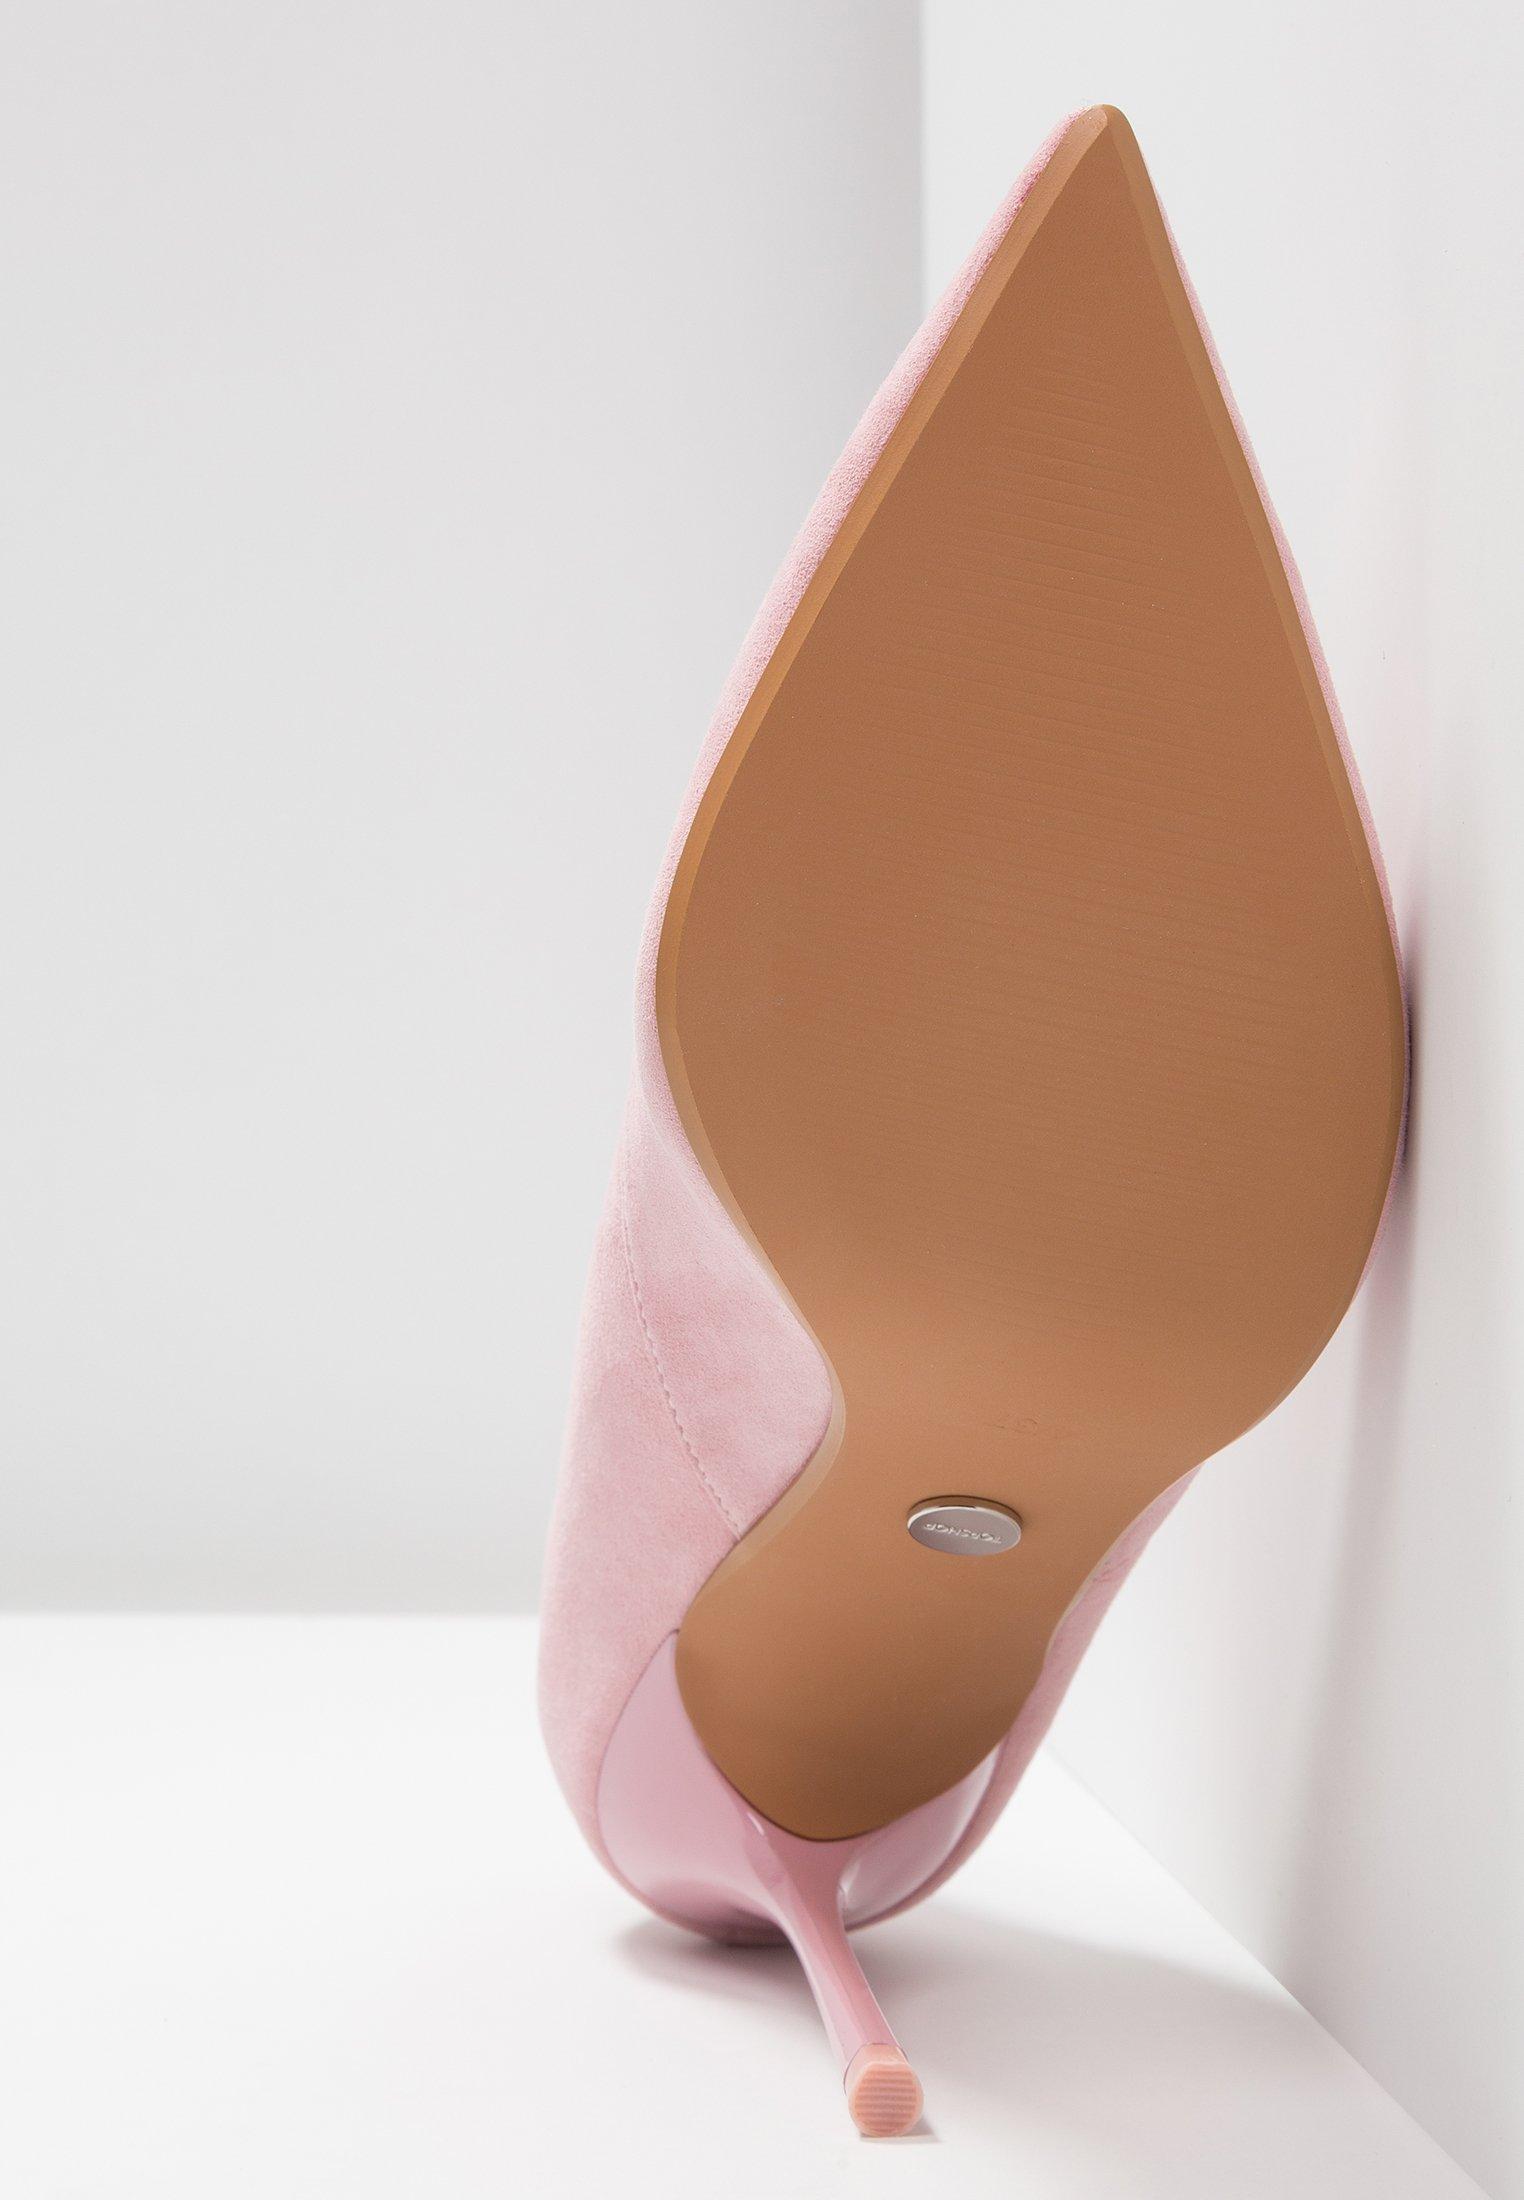 Topshop GIGI SKINNY COURT - Escarpins à talons hauts pink